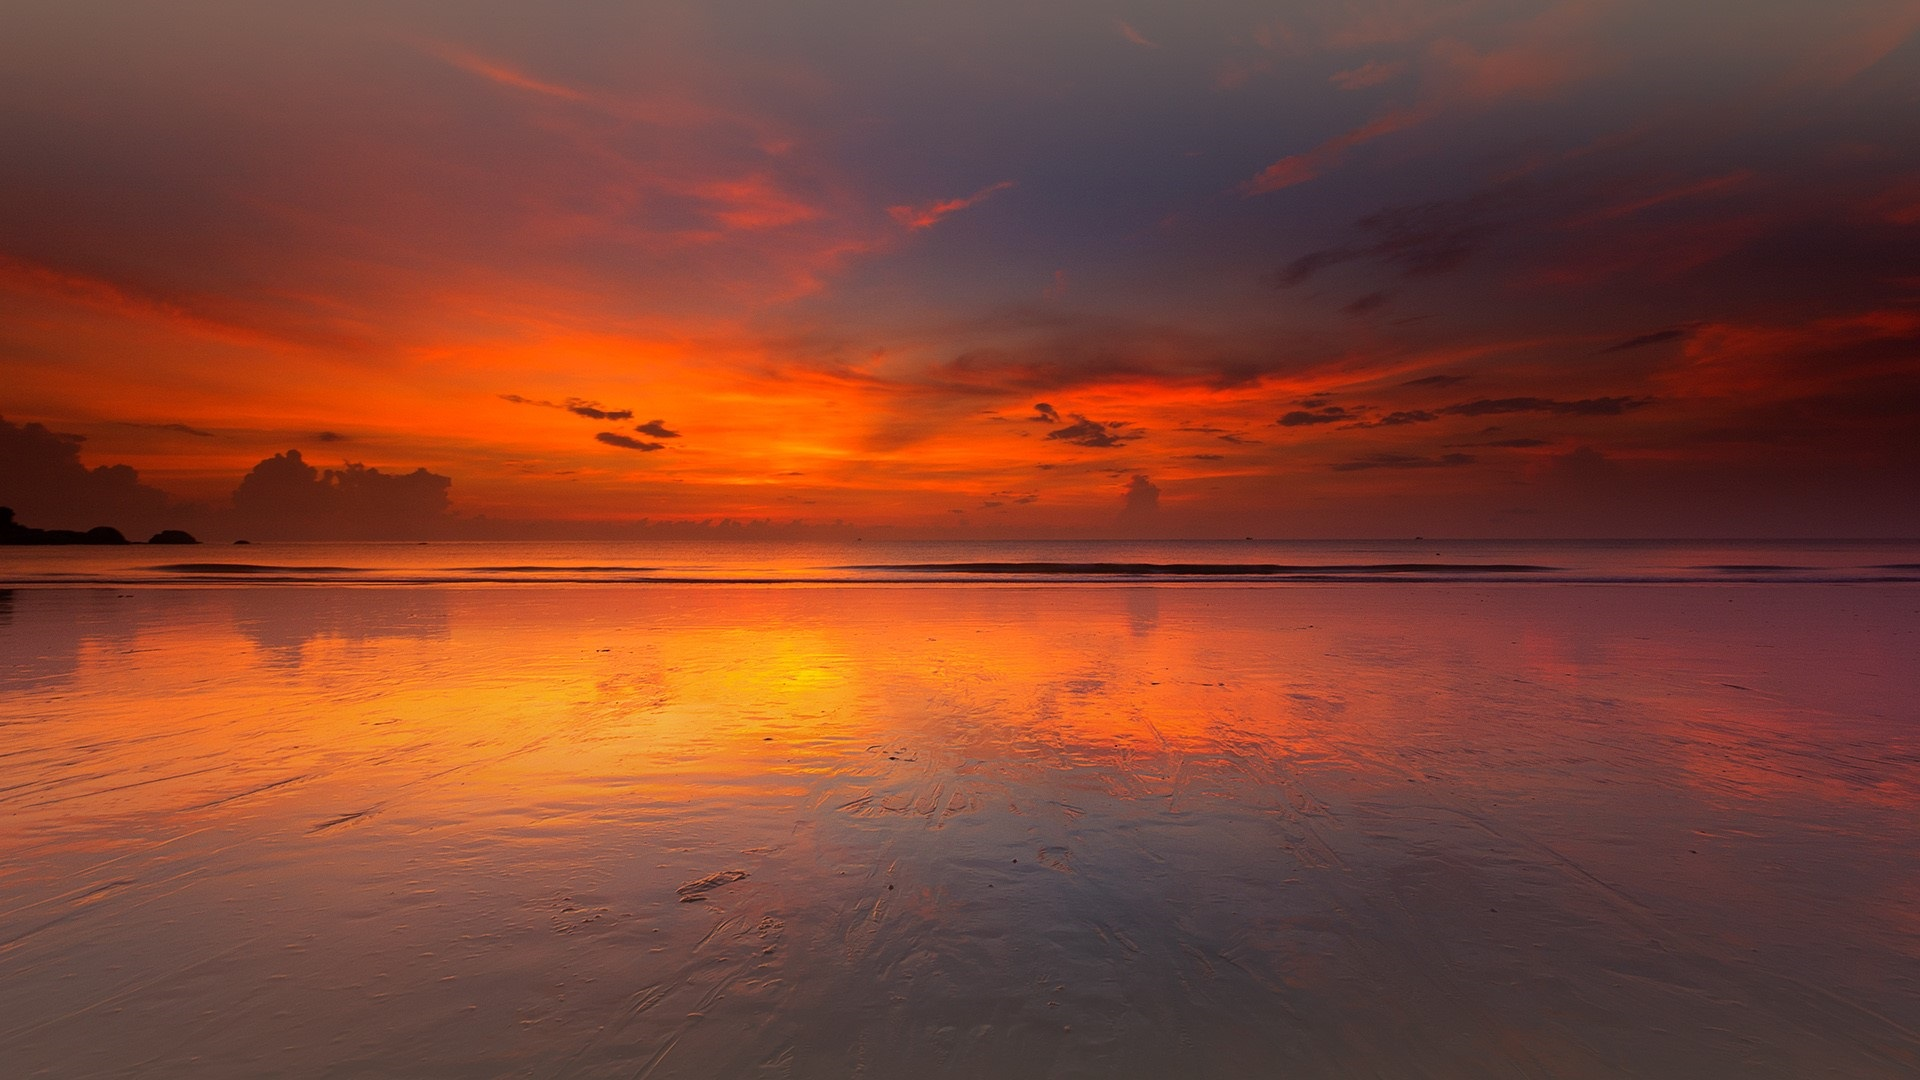 Kuantan Pahang Malaysia Sunset , HD Wallpaper & Backgrounds